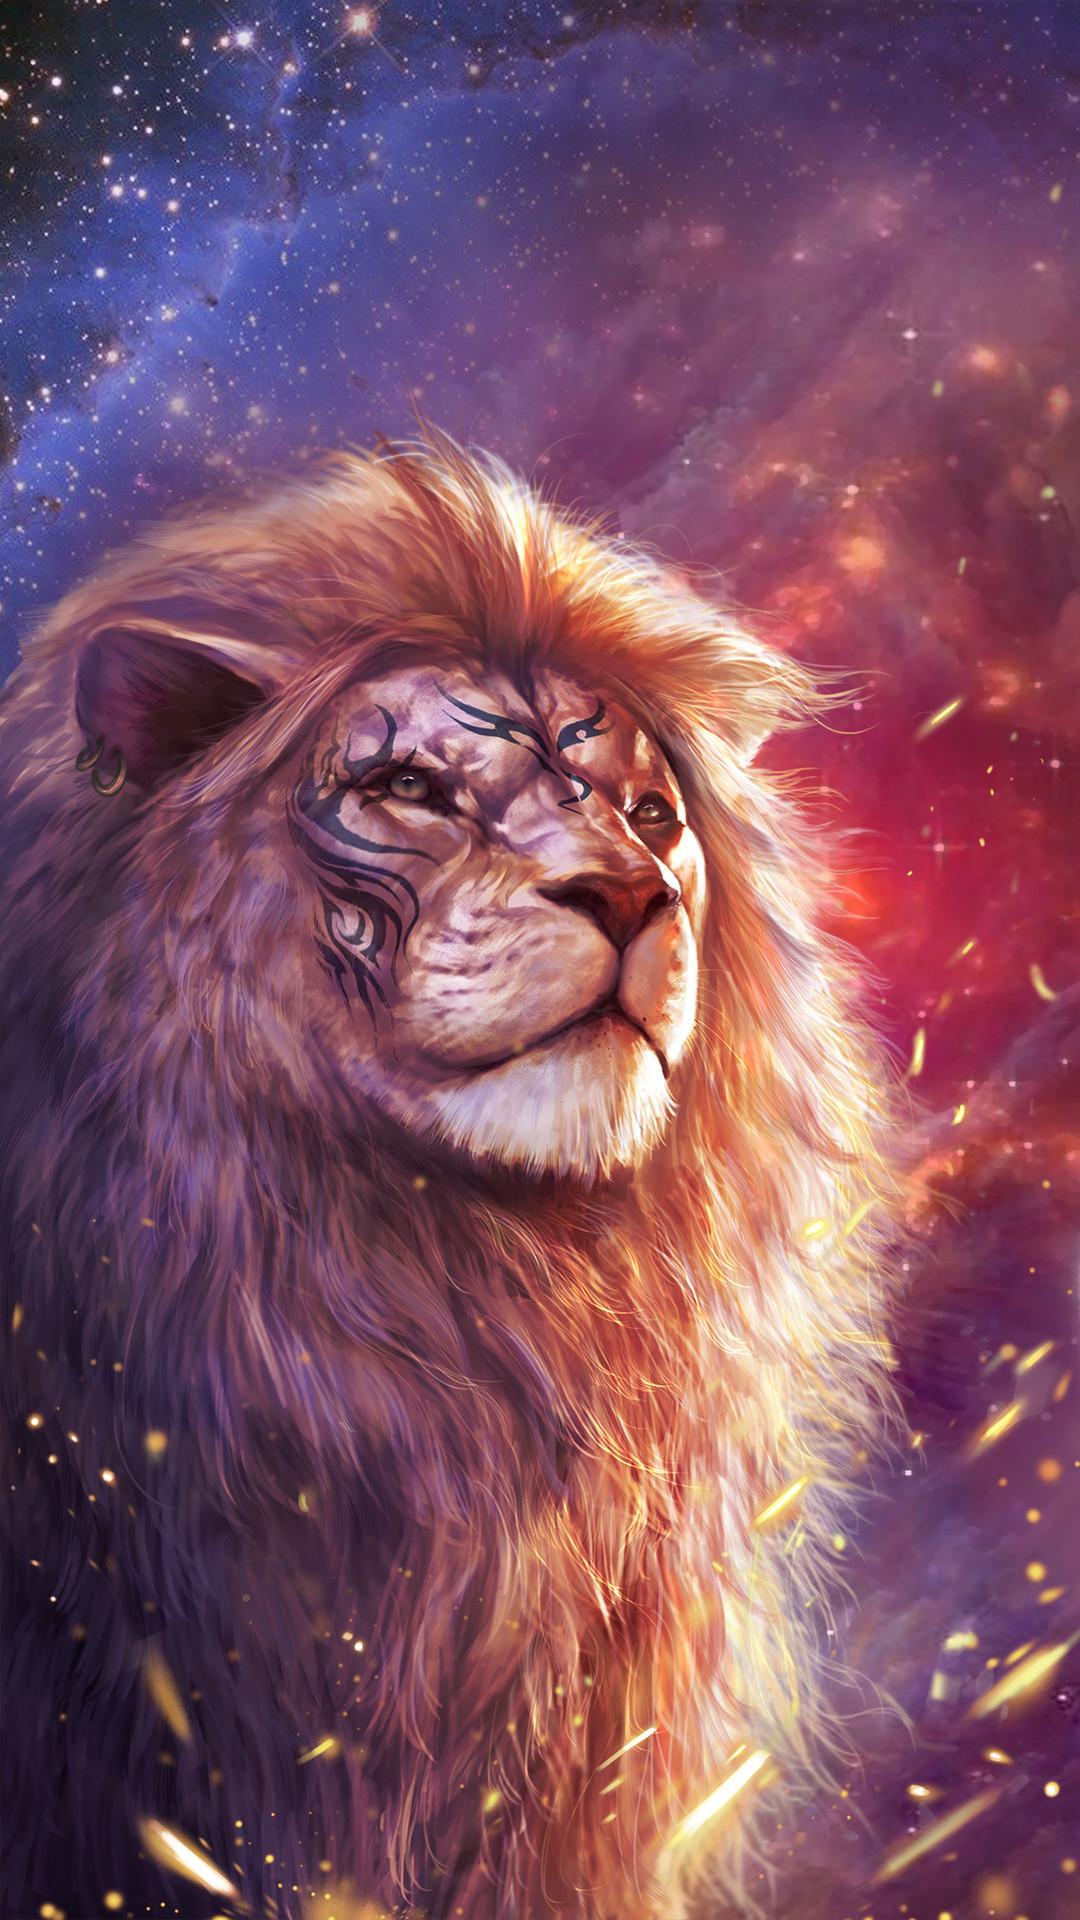 Lion pictures wallpaper - photo#37